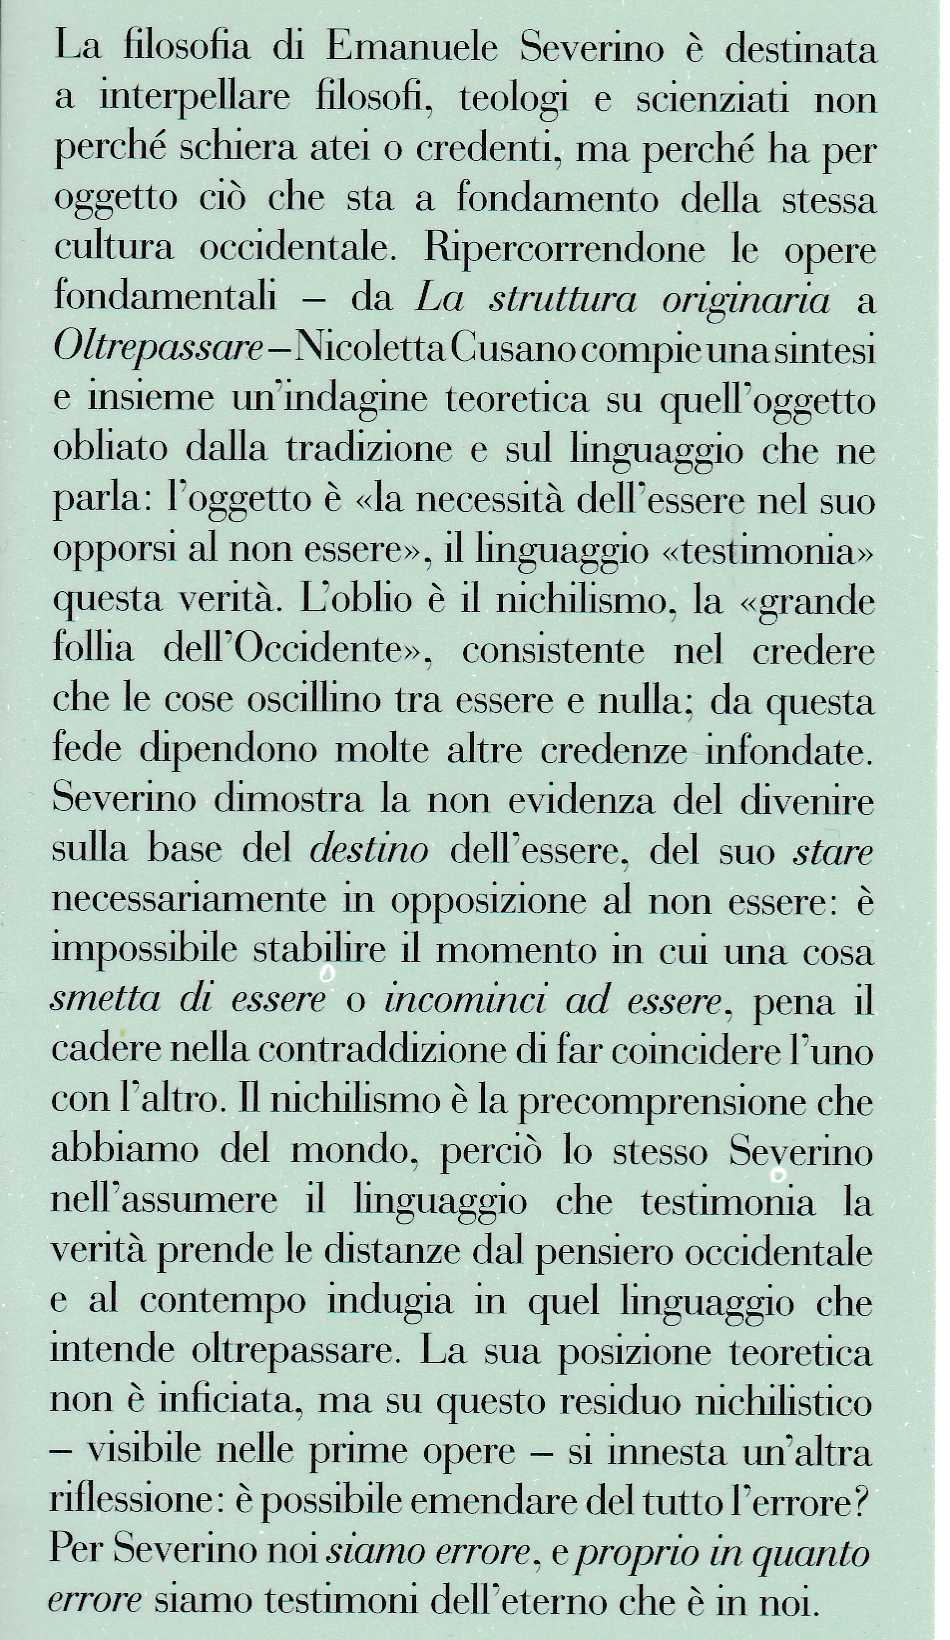 cusano-emanueleseverino-morcelliana5136